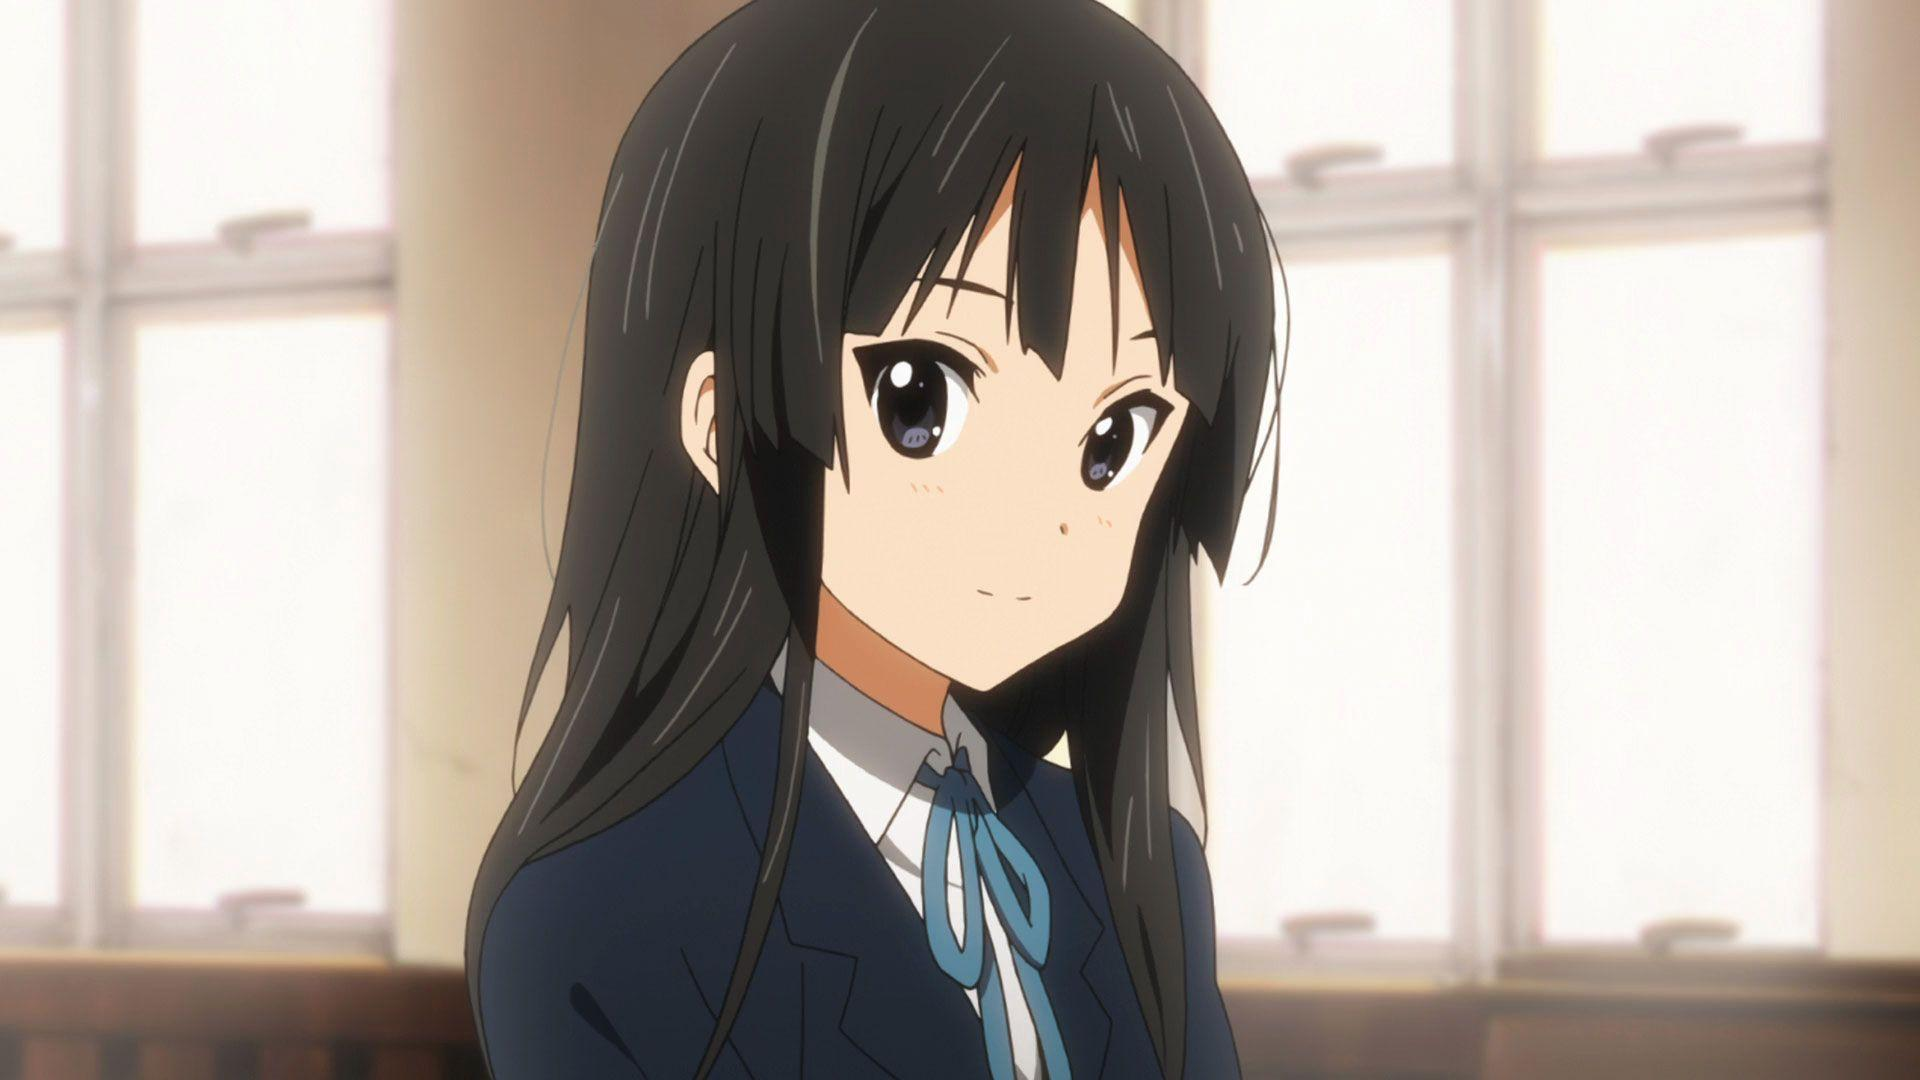 Quiet girl from K-ON! Mio Akiyama